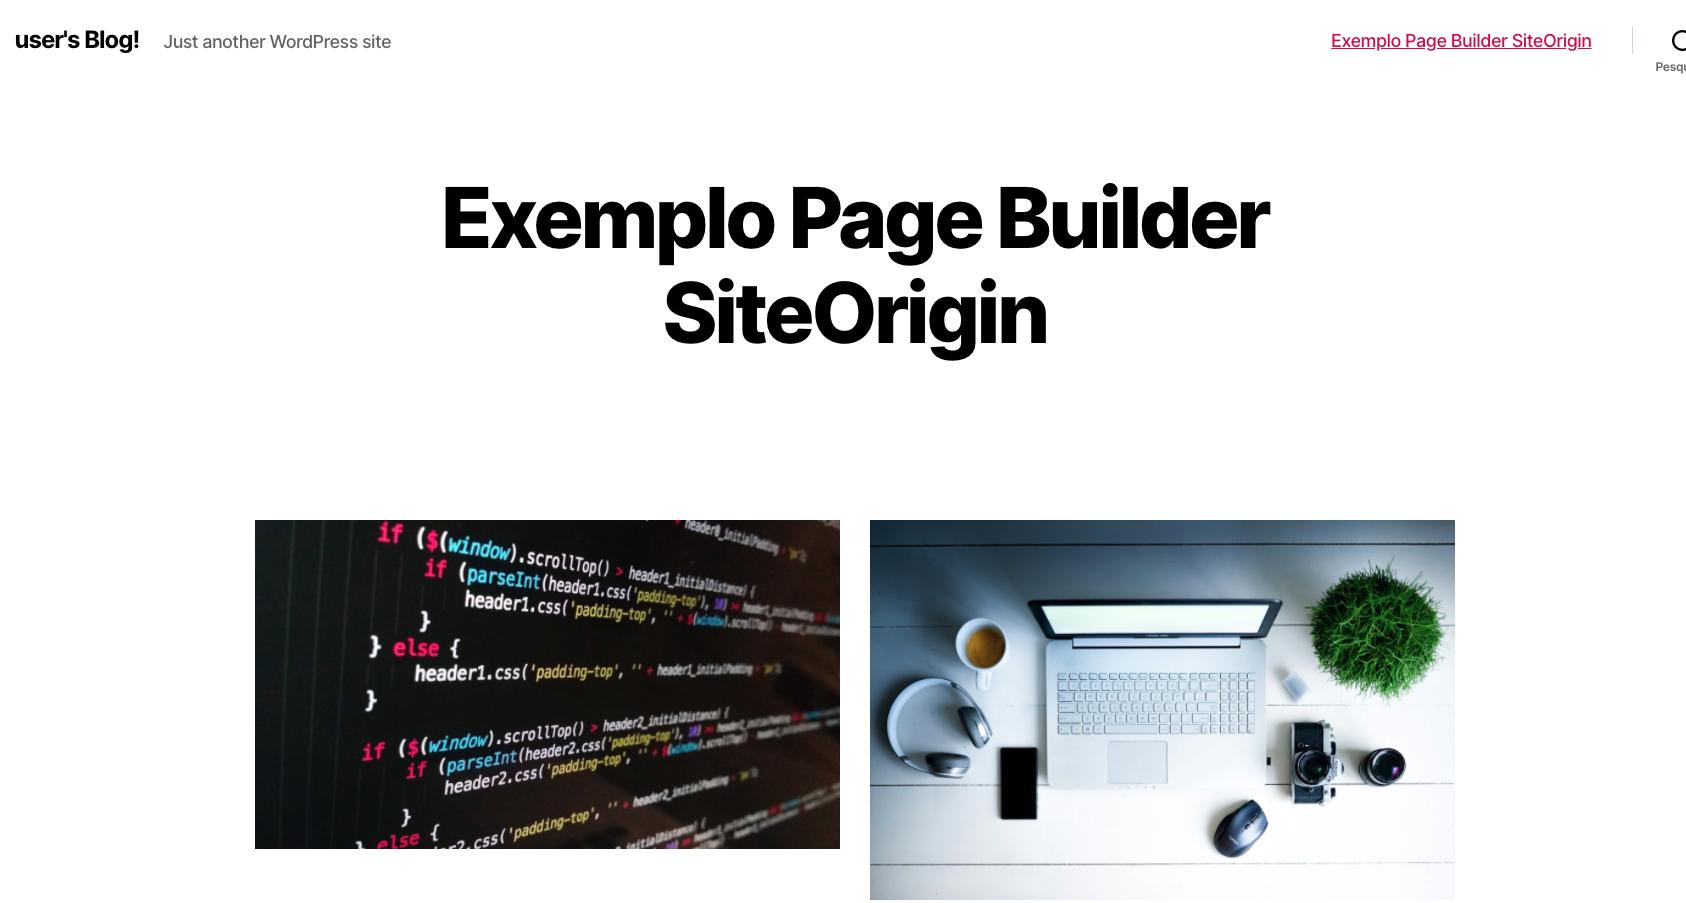 Pagina de exemplo com Page Builder SiteOrigin